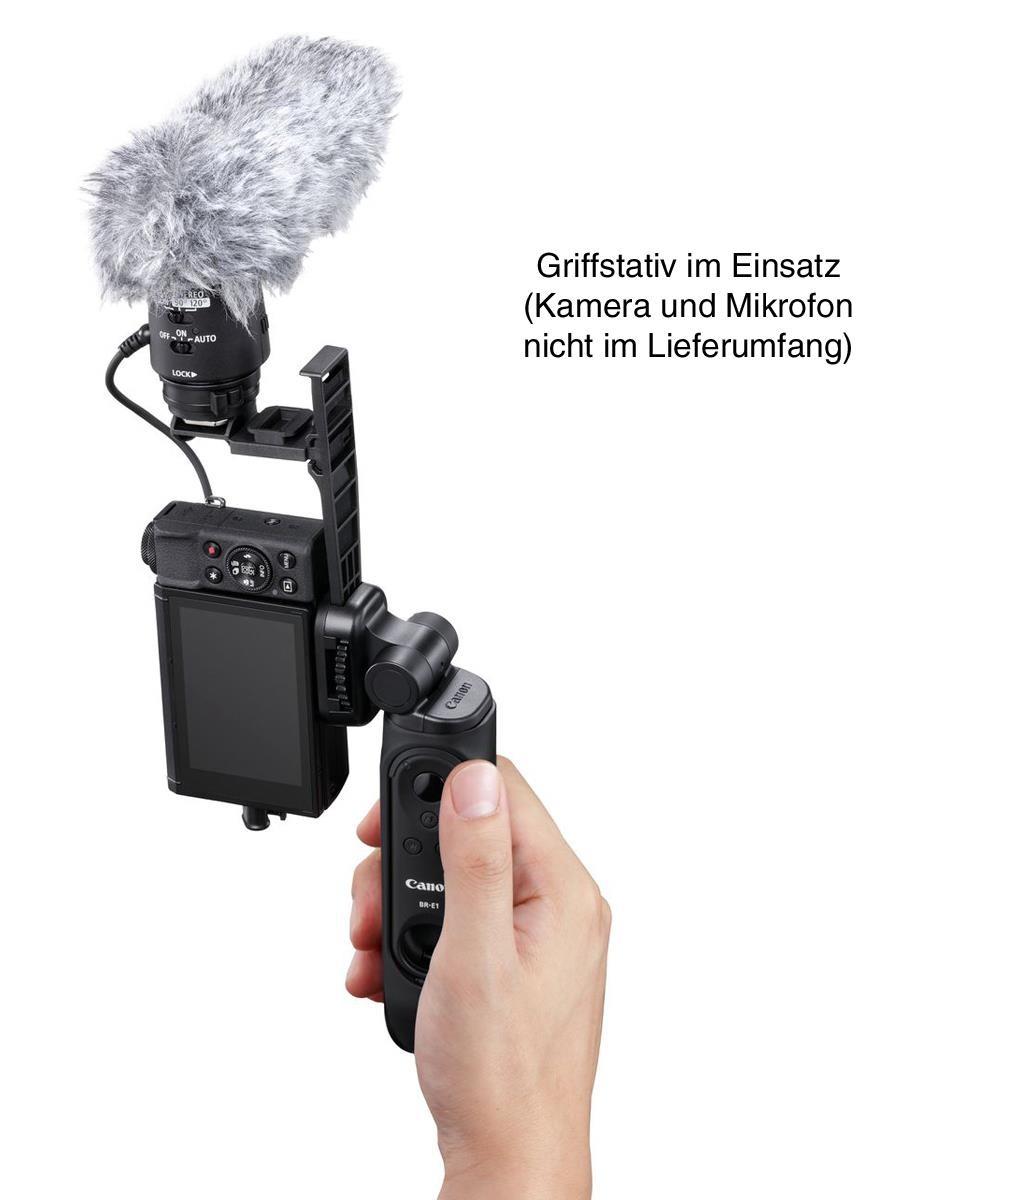 Canon HG-100TBR Griffstativ inkl. BR-E1 Fernbedienung 108164